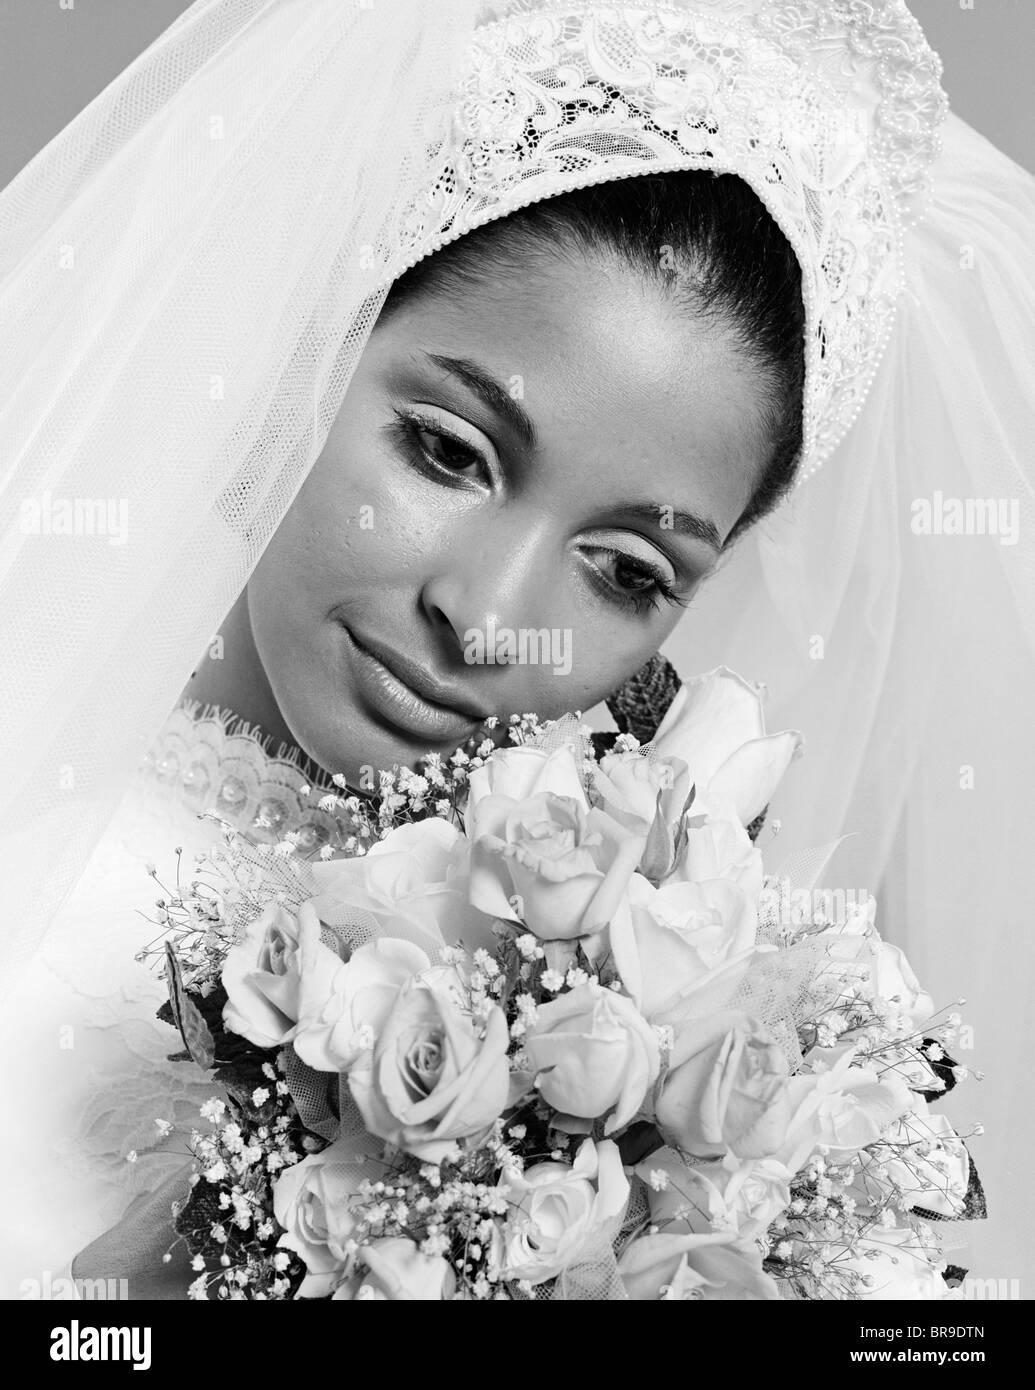 1970s Marriage Stockfotos & 1970s Marriage Bilder - Alamy